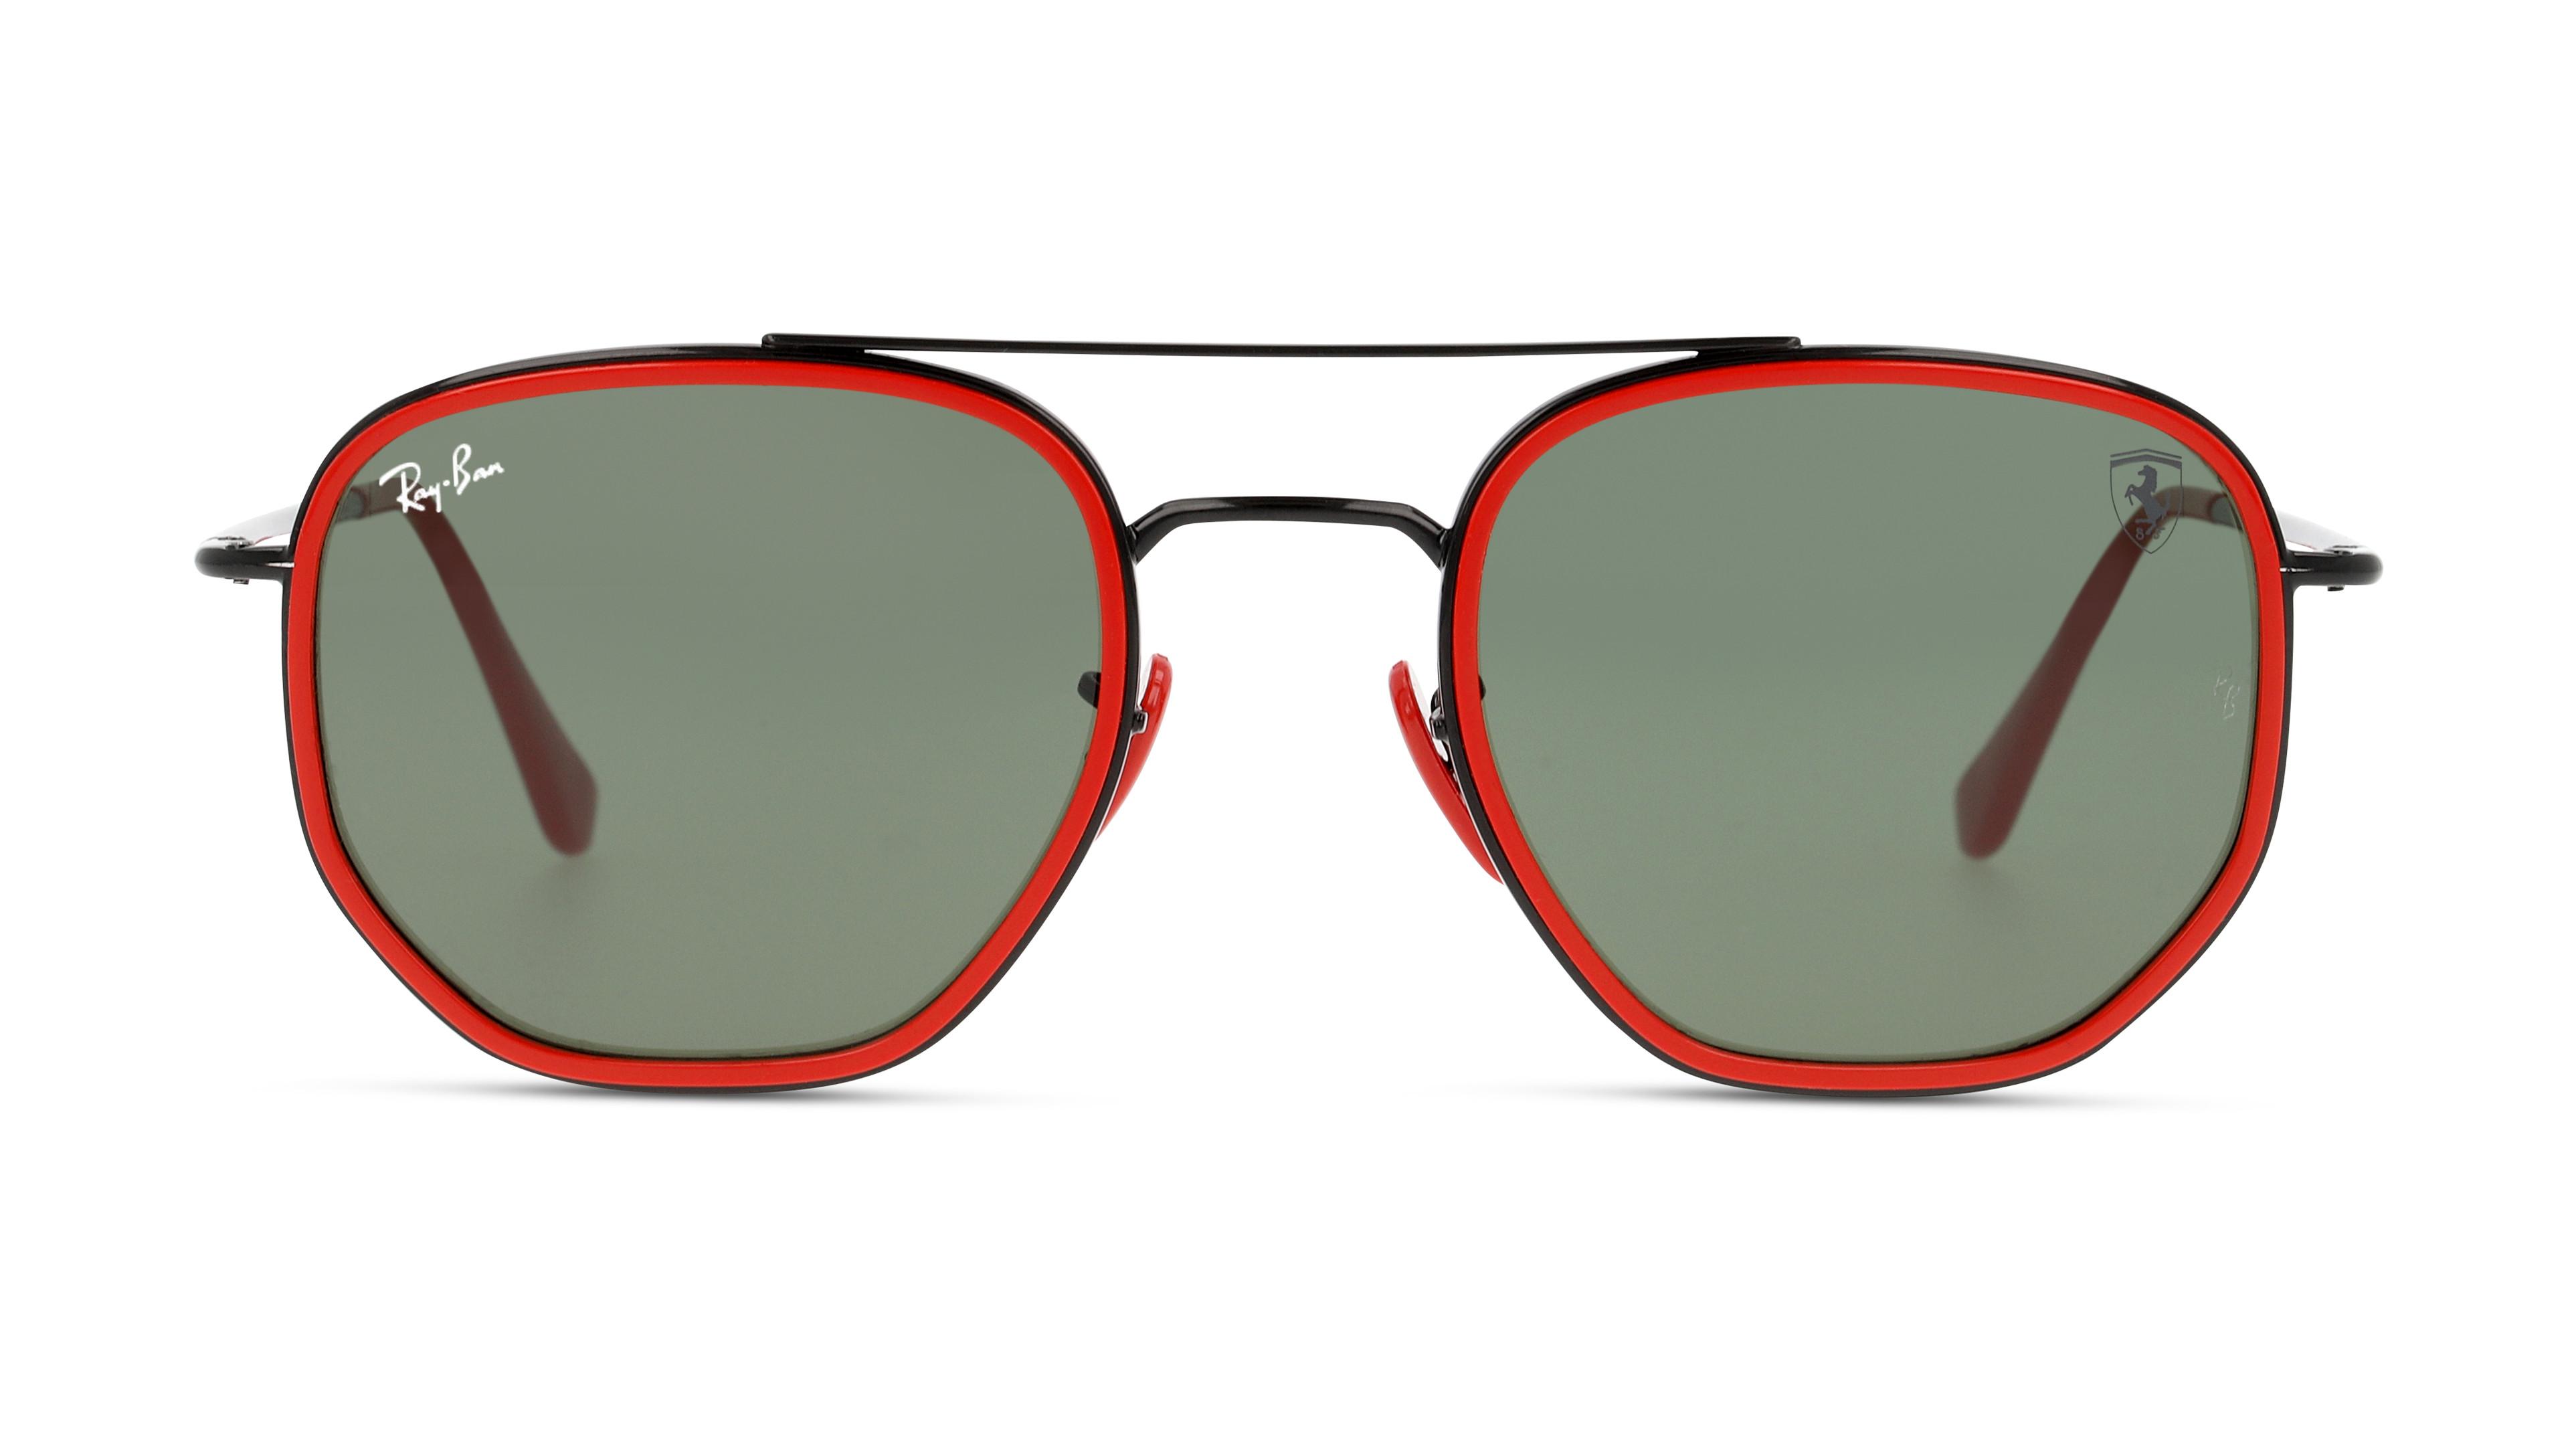 8056597148320-front-Ray-Ban-Sonnenbrille-0rb3748m-Scuderia-Ferrari-Edition